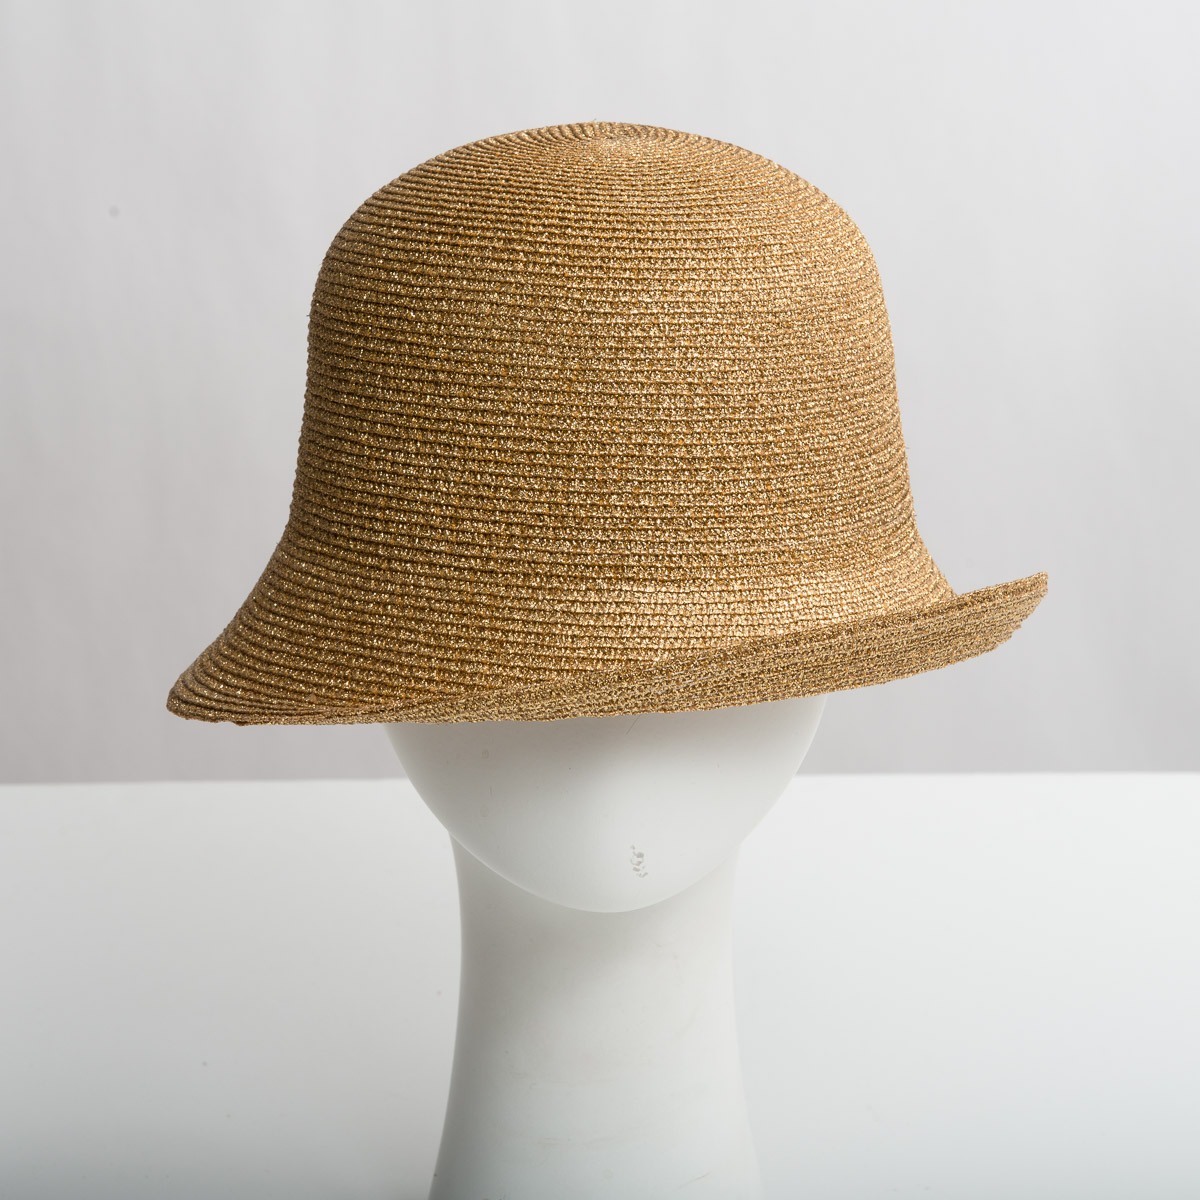 29f717ceb97 Cloche Small Brim Metallic Plain Hats-HK6015-0-Sun Yorkos